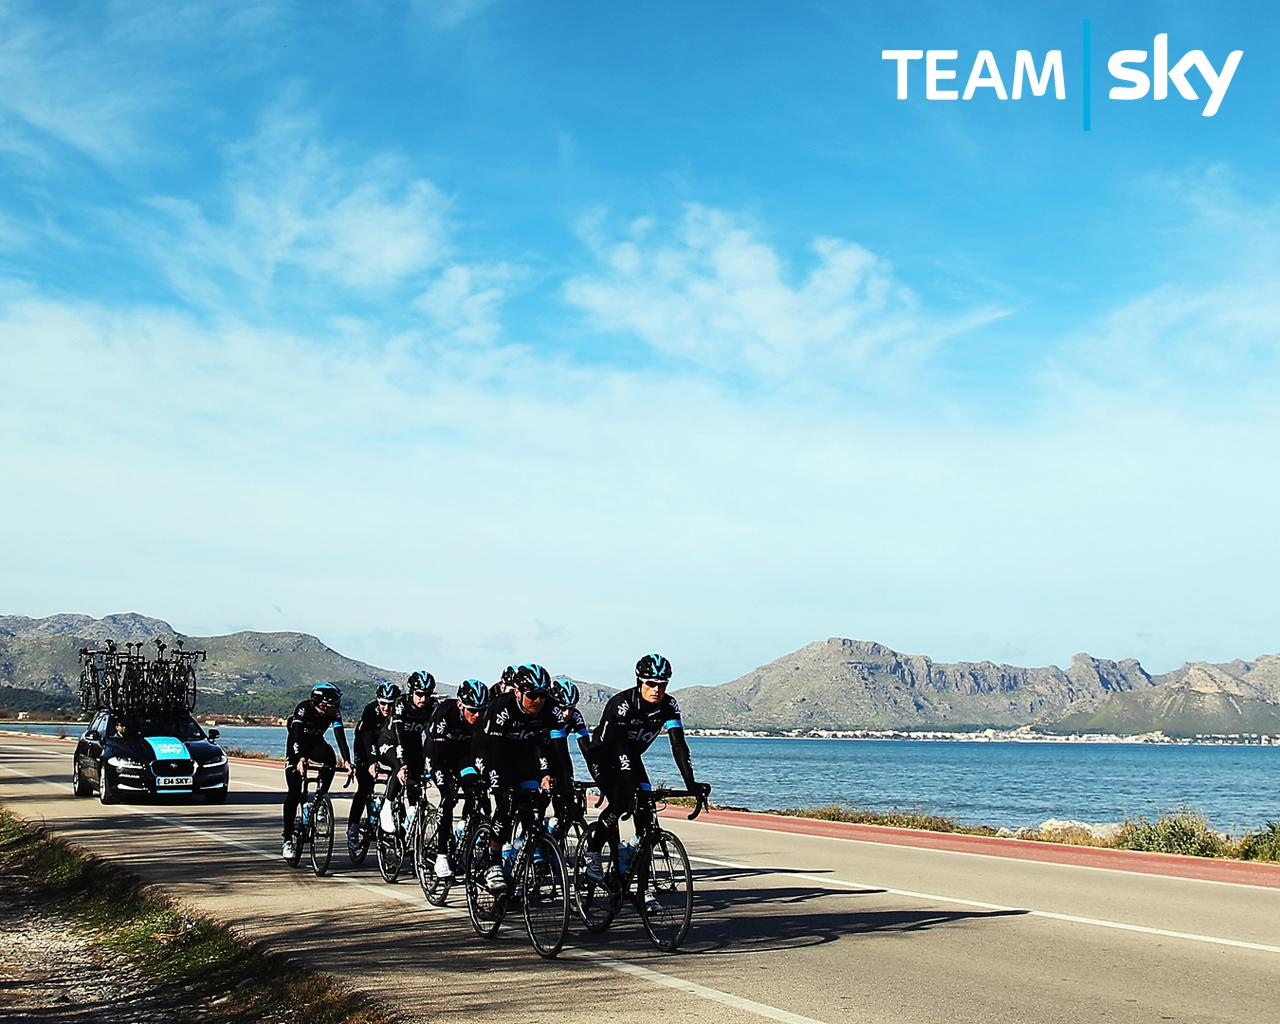 Team Sky Wallpapers 1280x1024